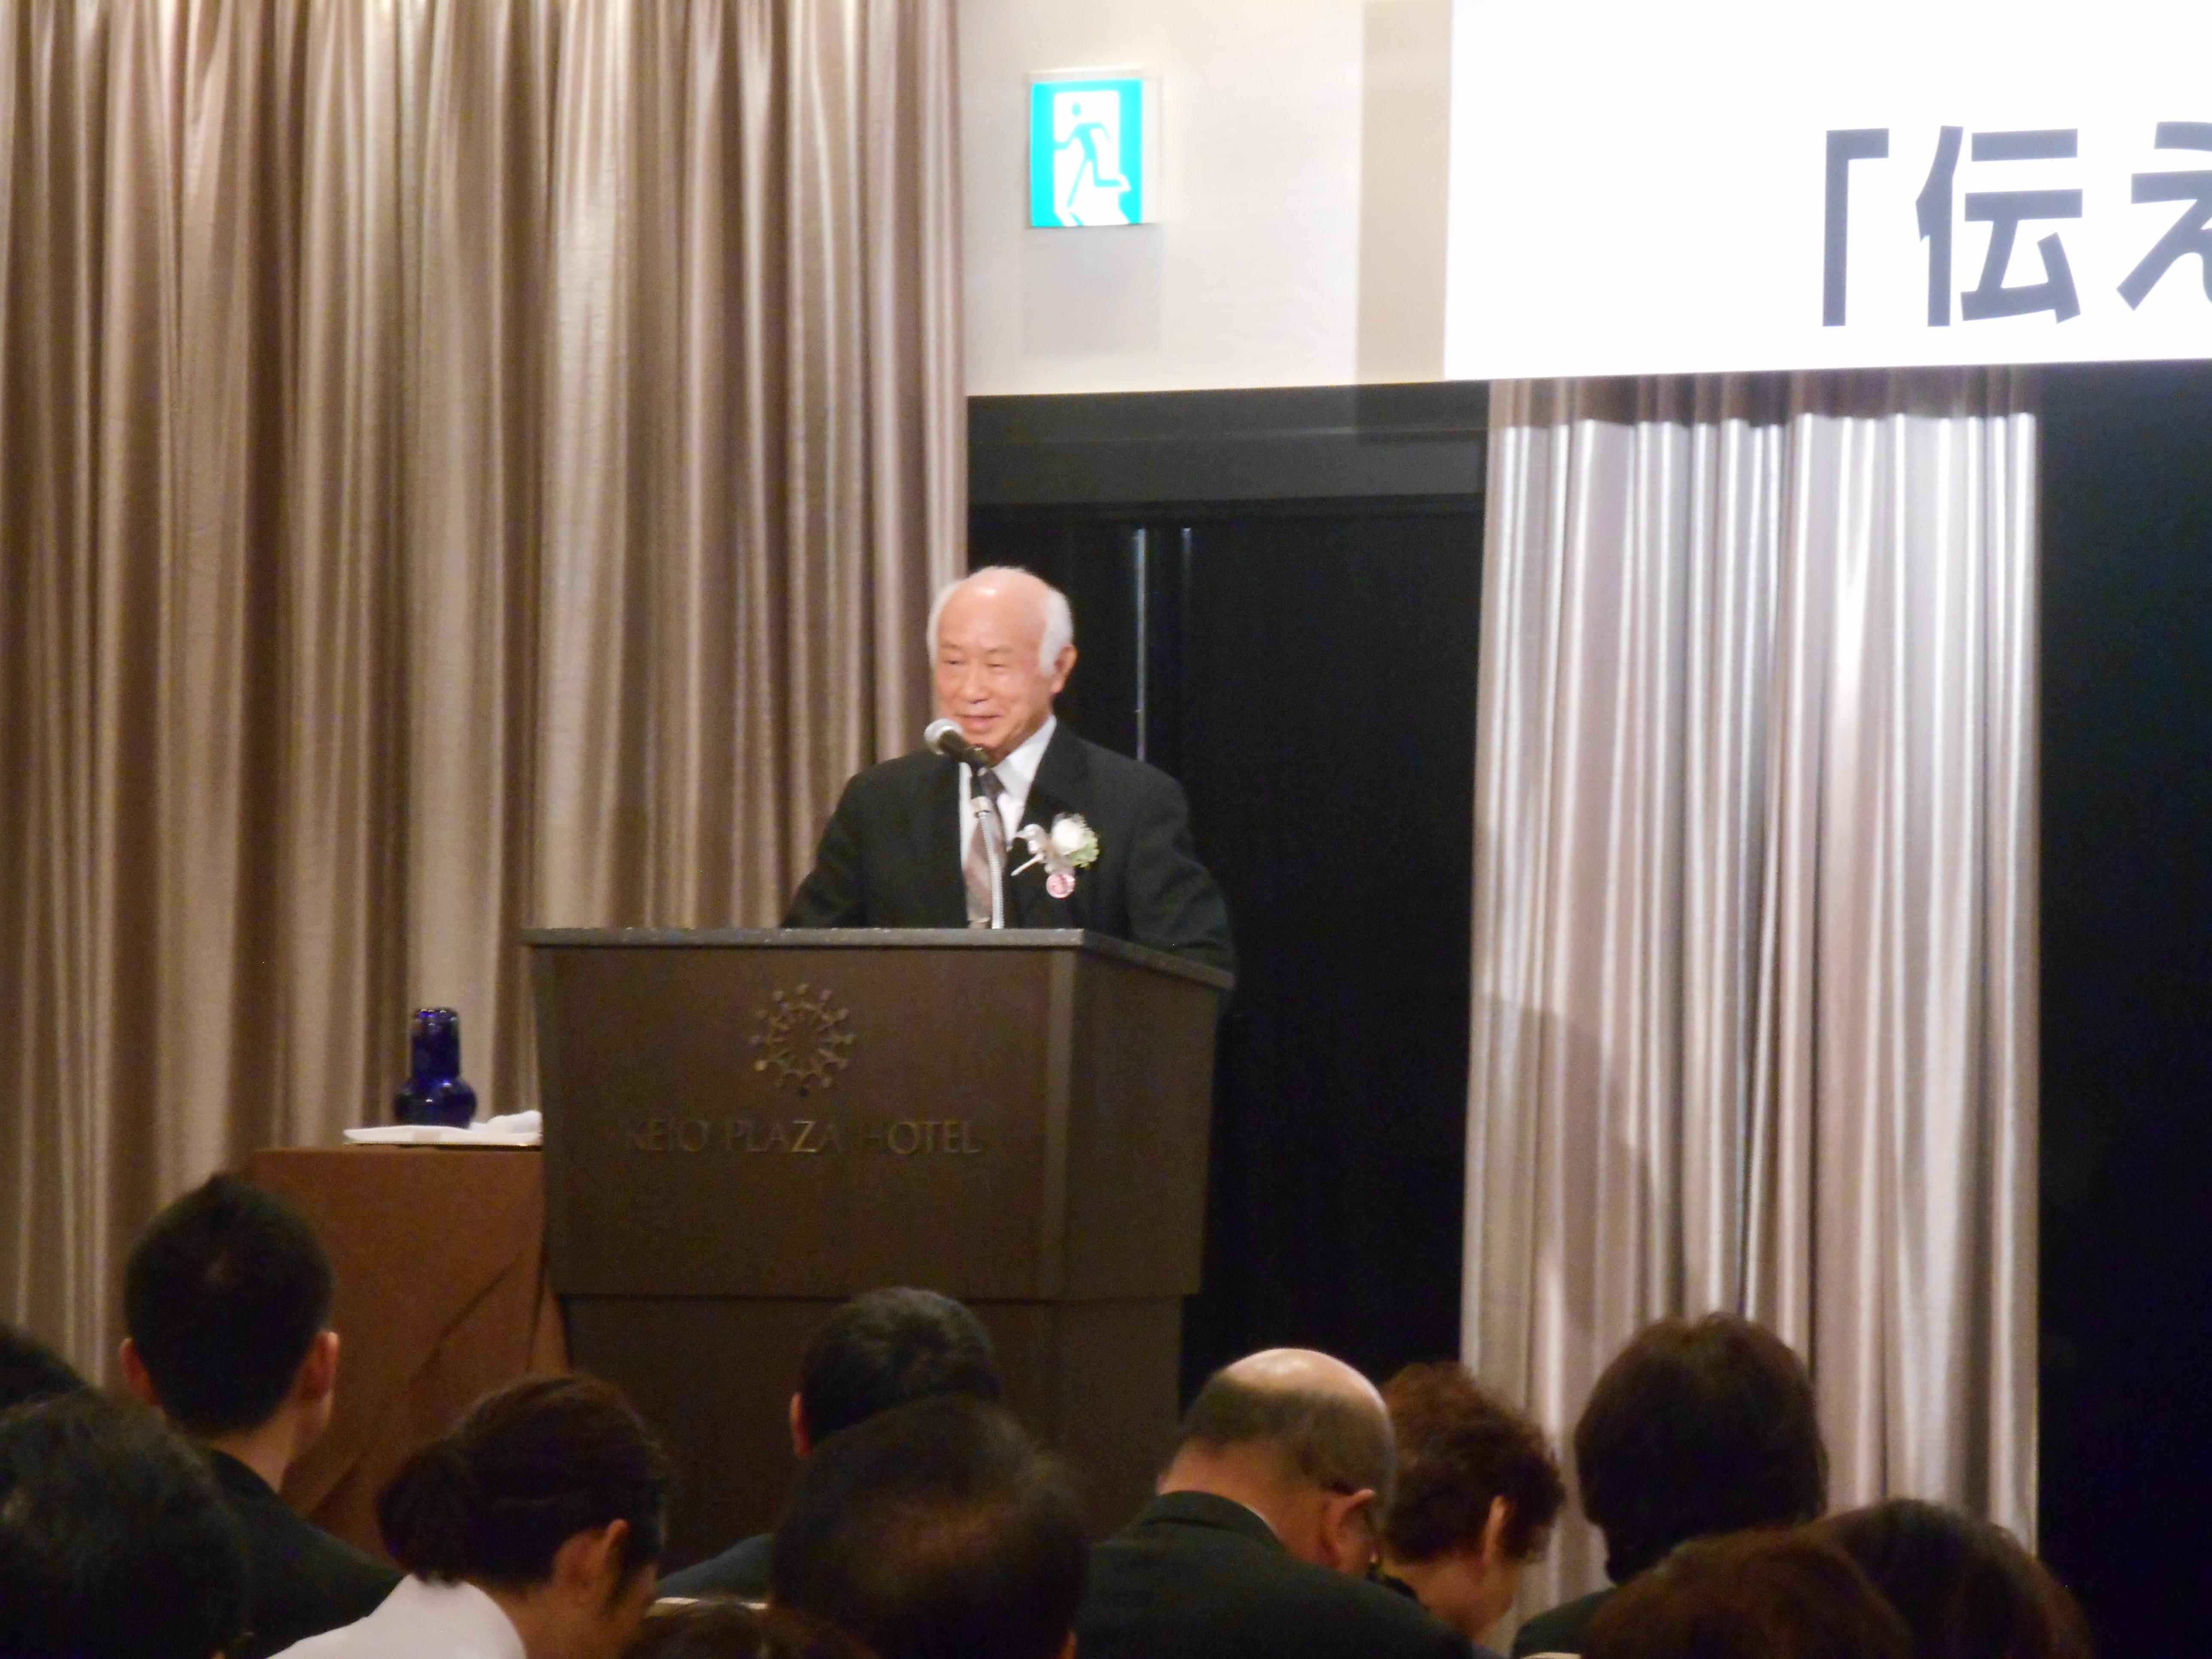 DSCN2065 - 平成30年度 東京思風塾 4月7日(土)「時代が問題をつくり、問題が人物をつくる」